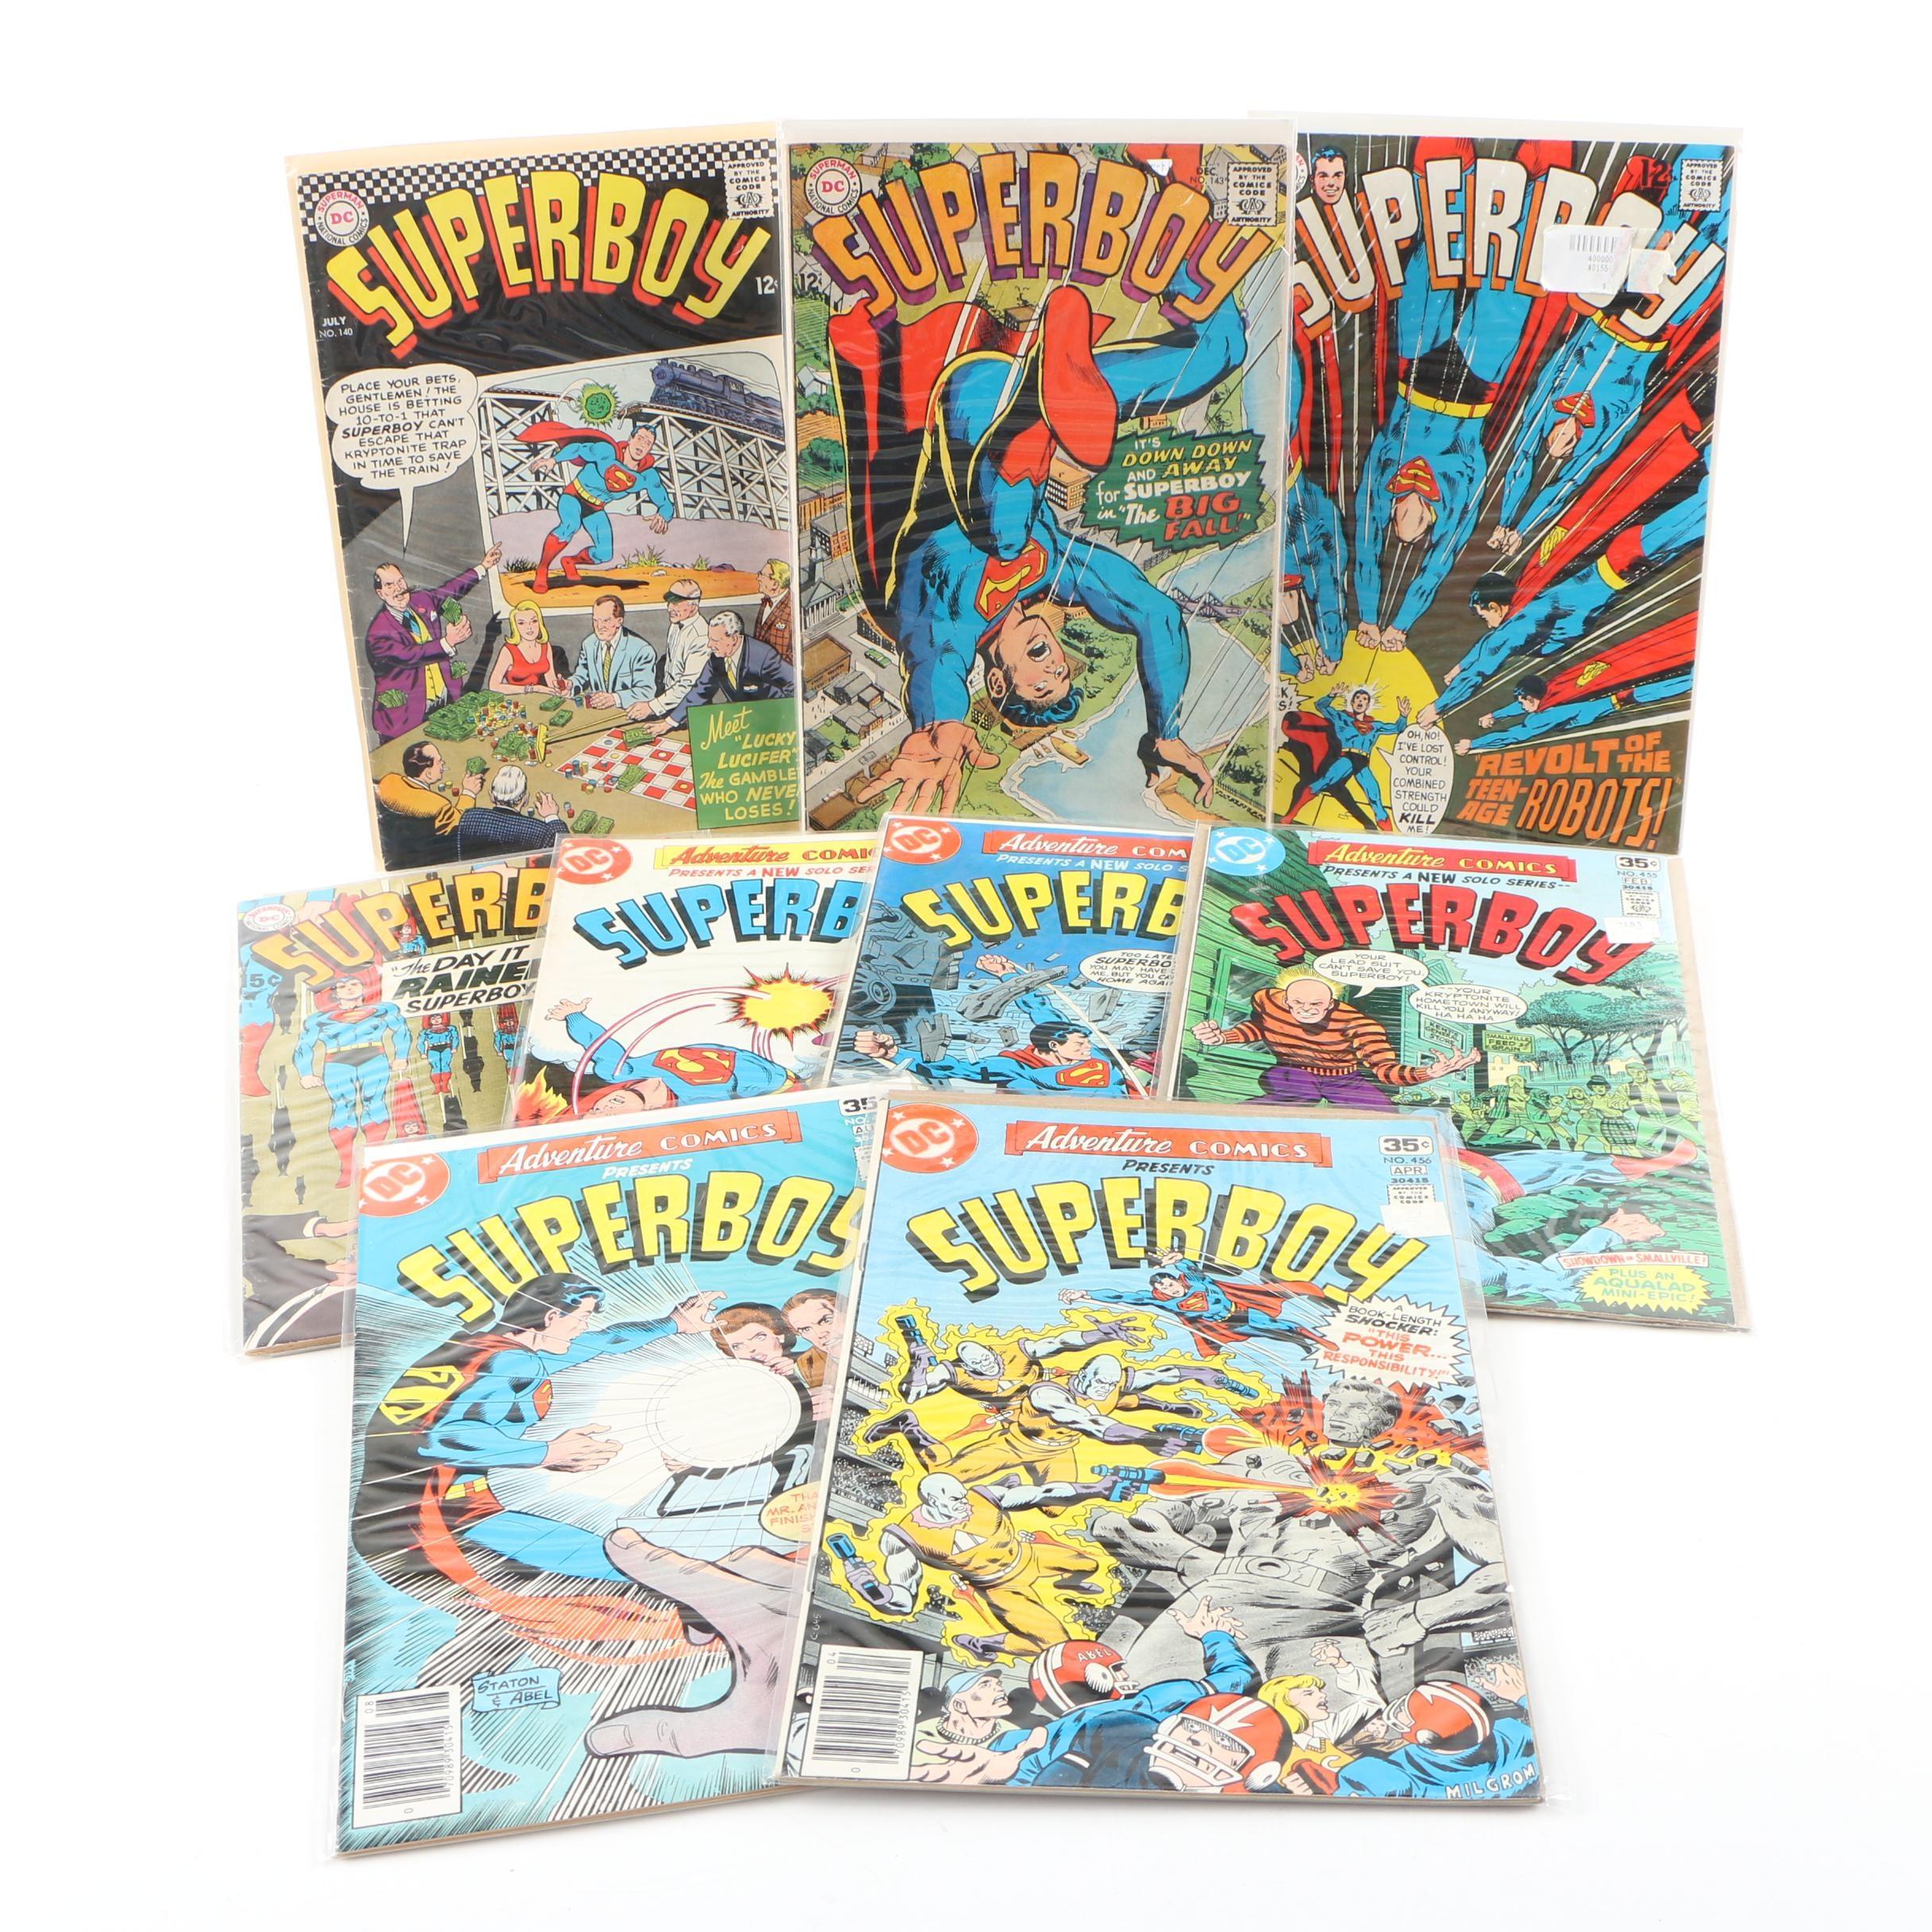 Superboy by DC Comics, 1960s - 1970s